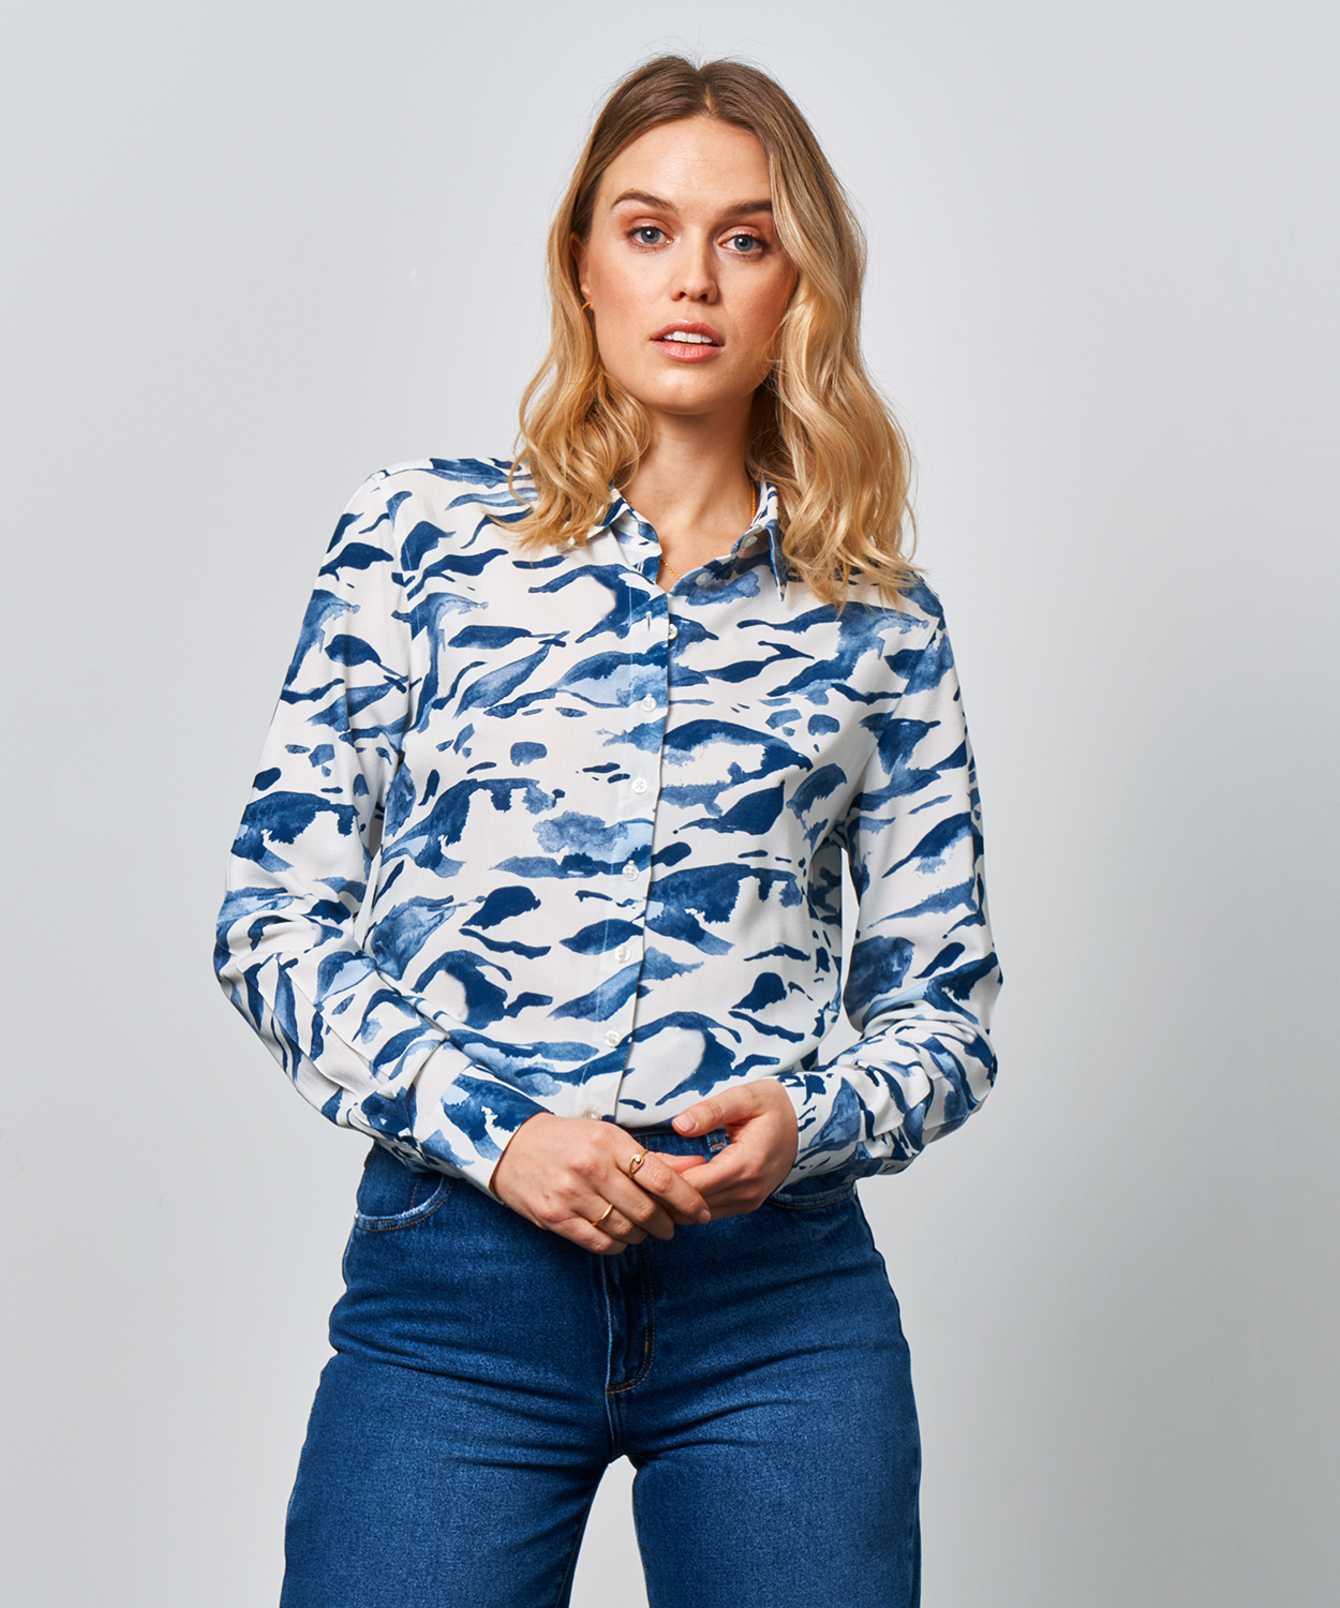 Skjorta Tilde Ocean The Shirt Factory